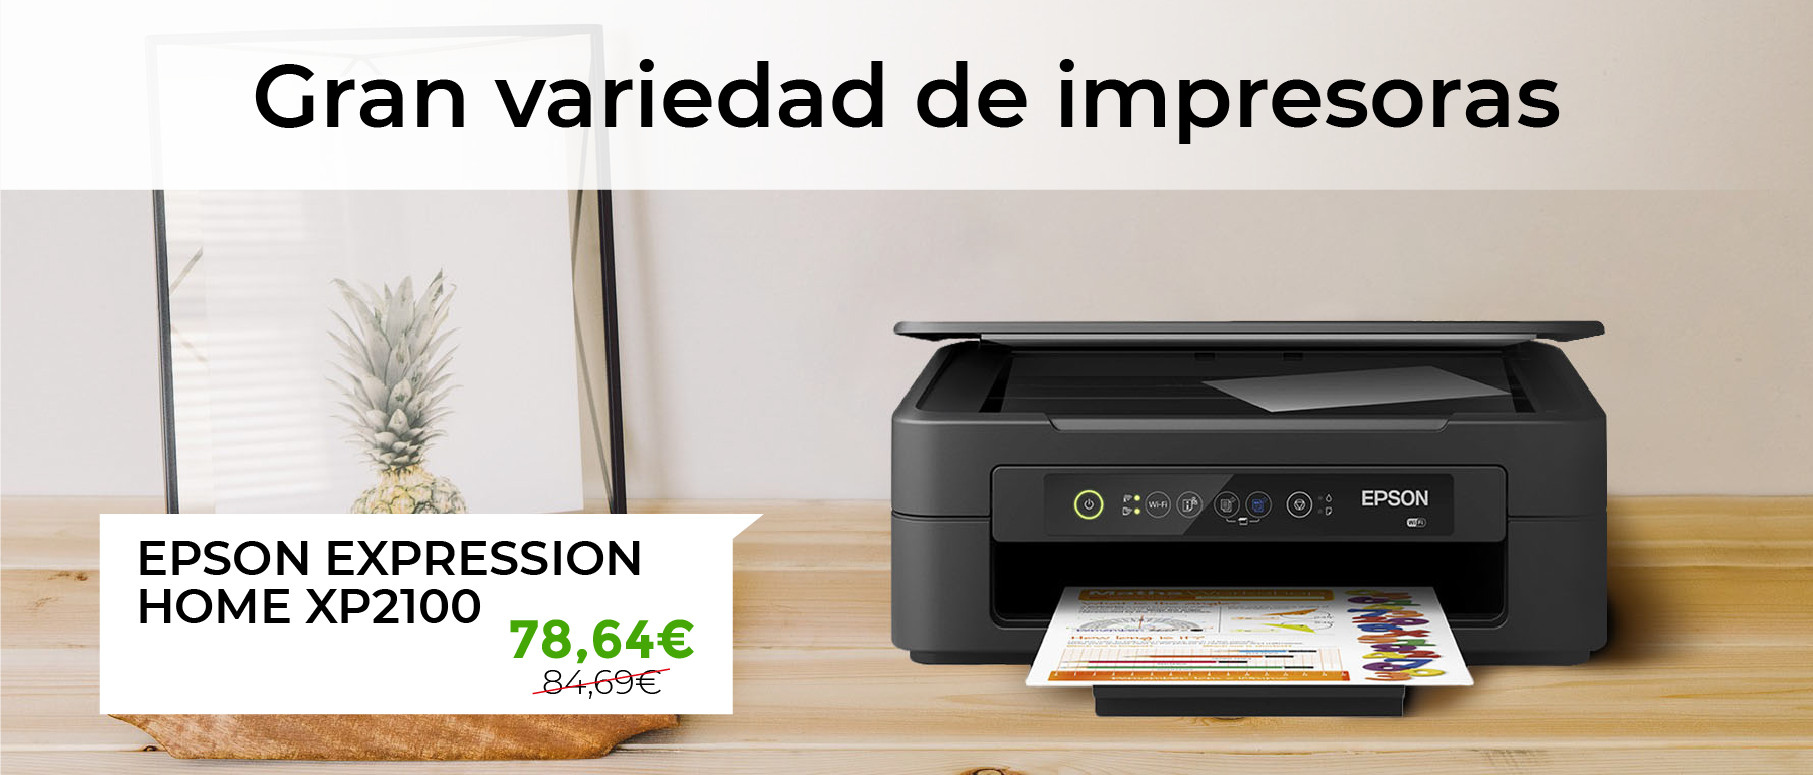 Banner Ecommerce Ecotisa Impresora EpsonXP2100